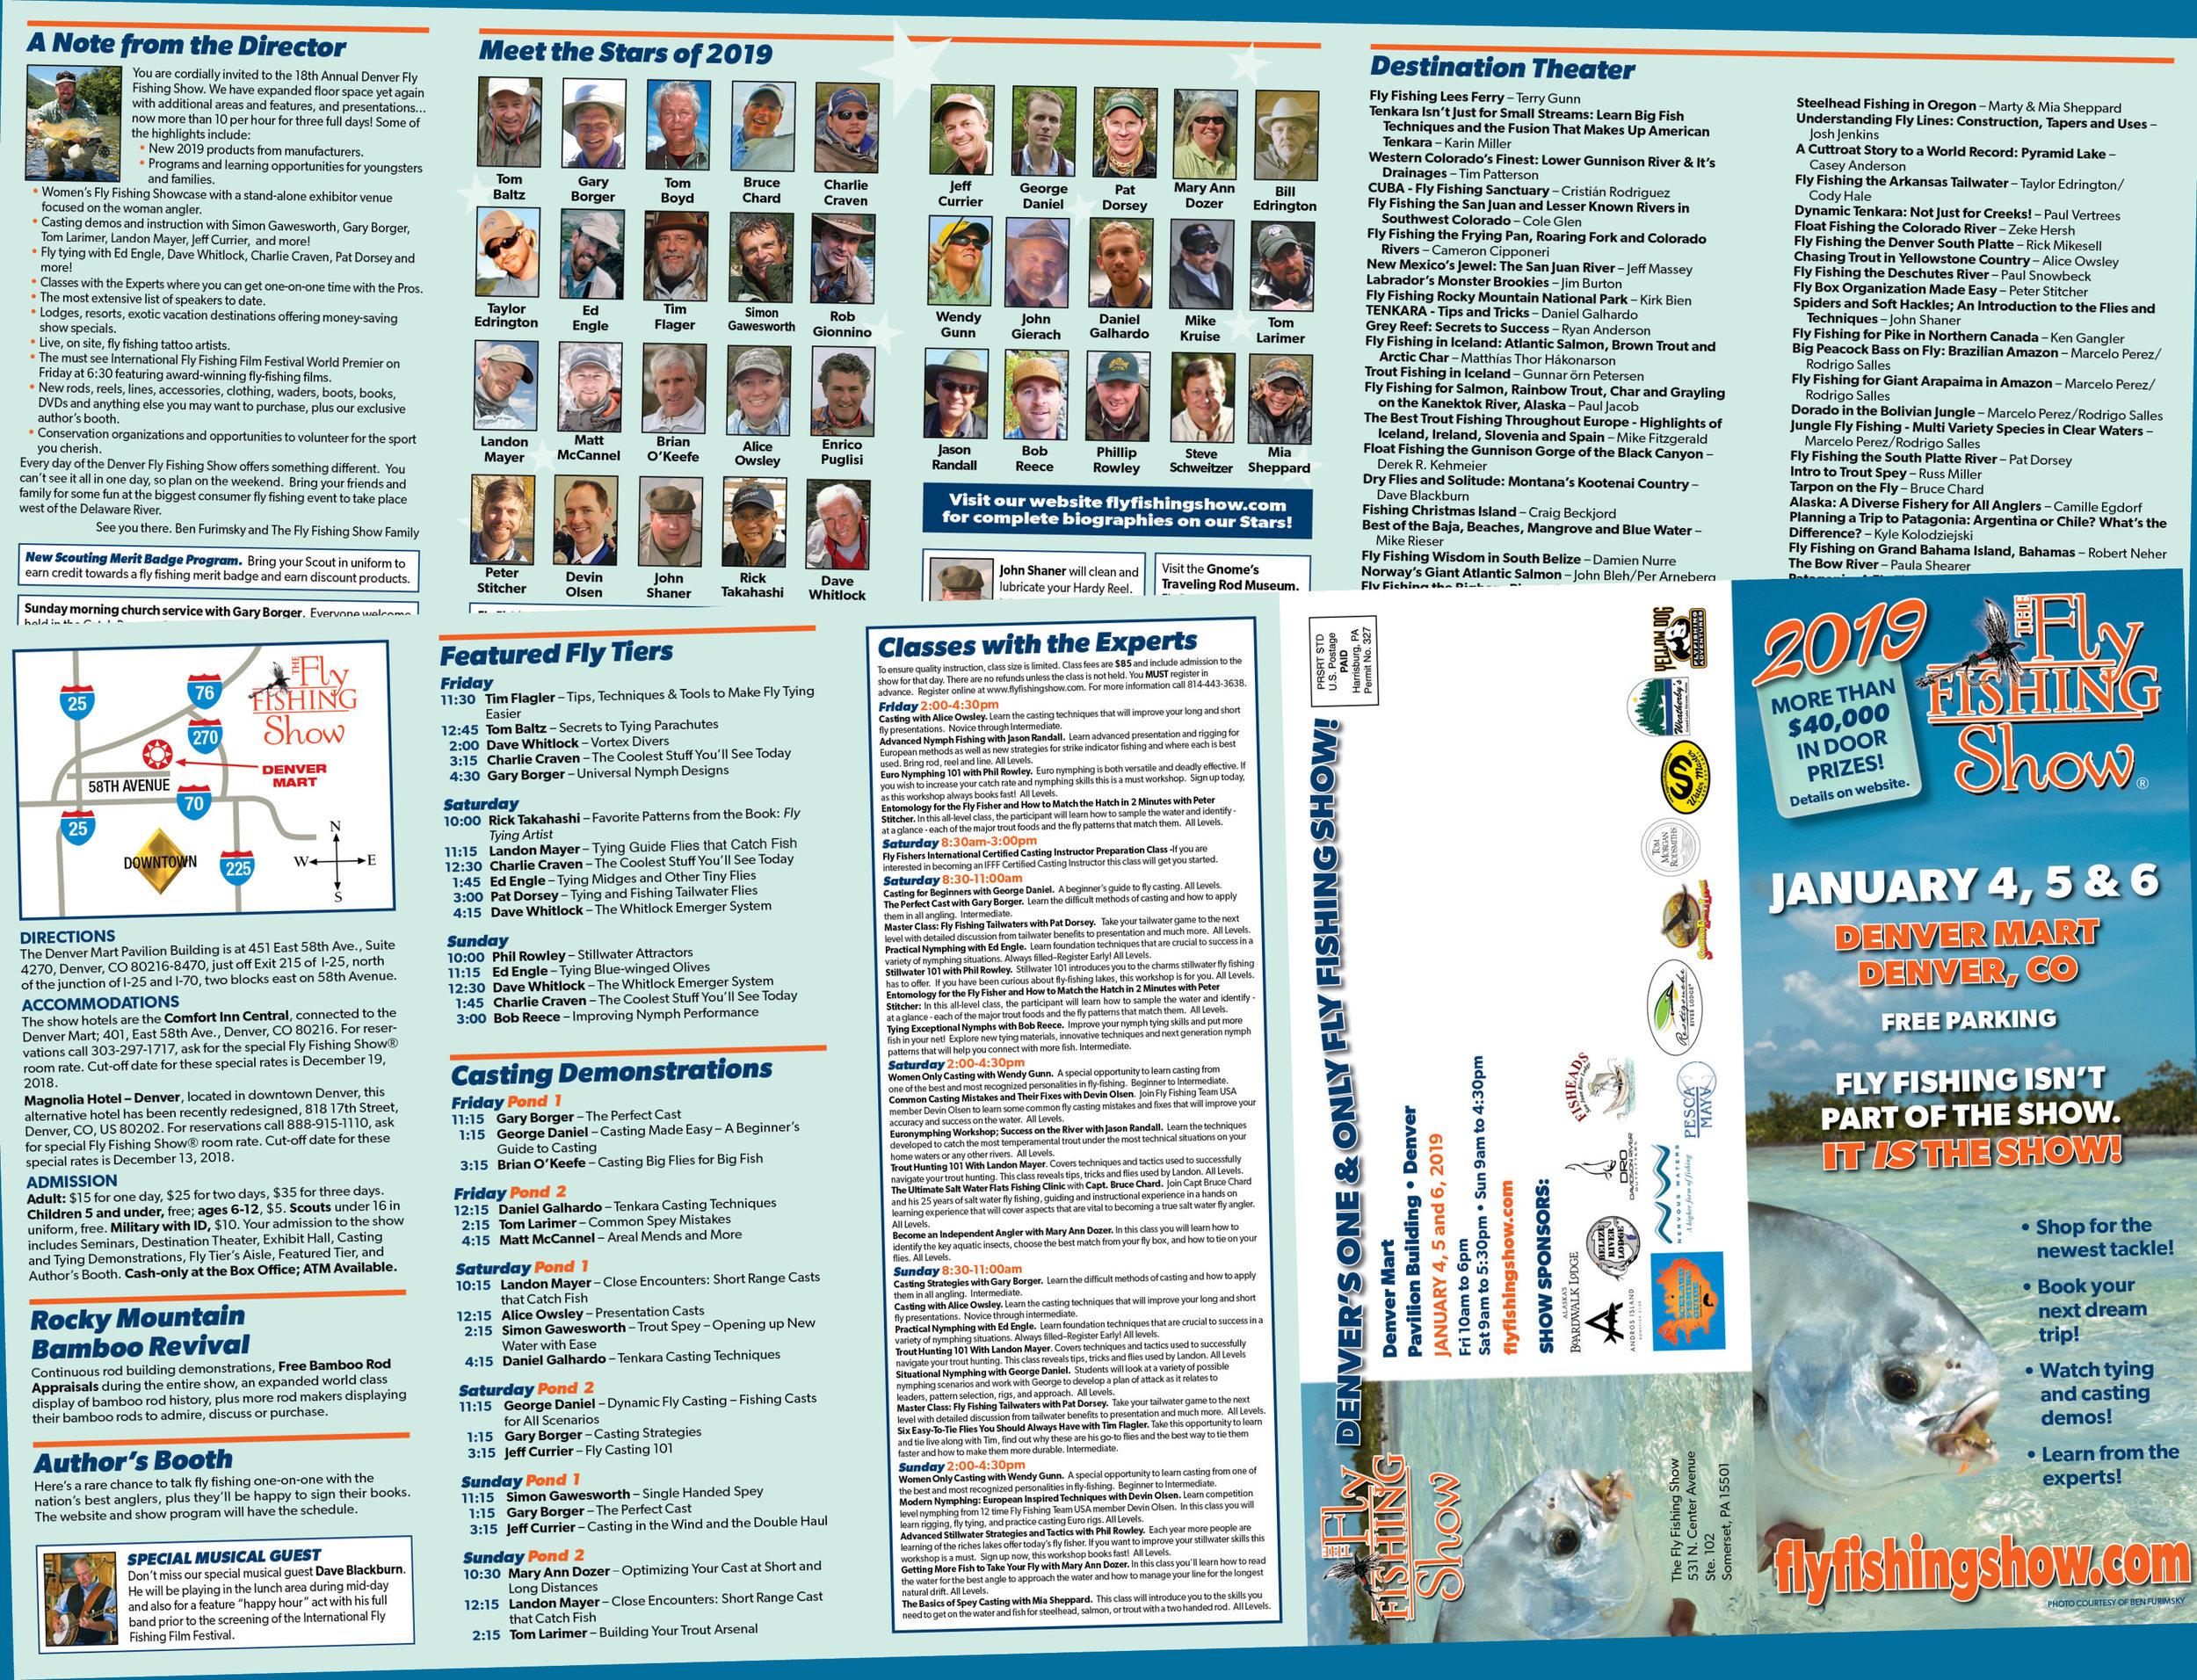 FF SHOW brochure.jpg